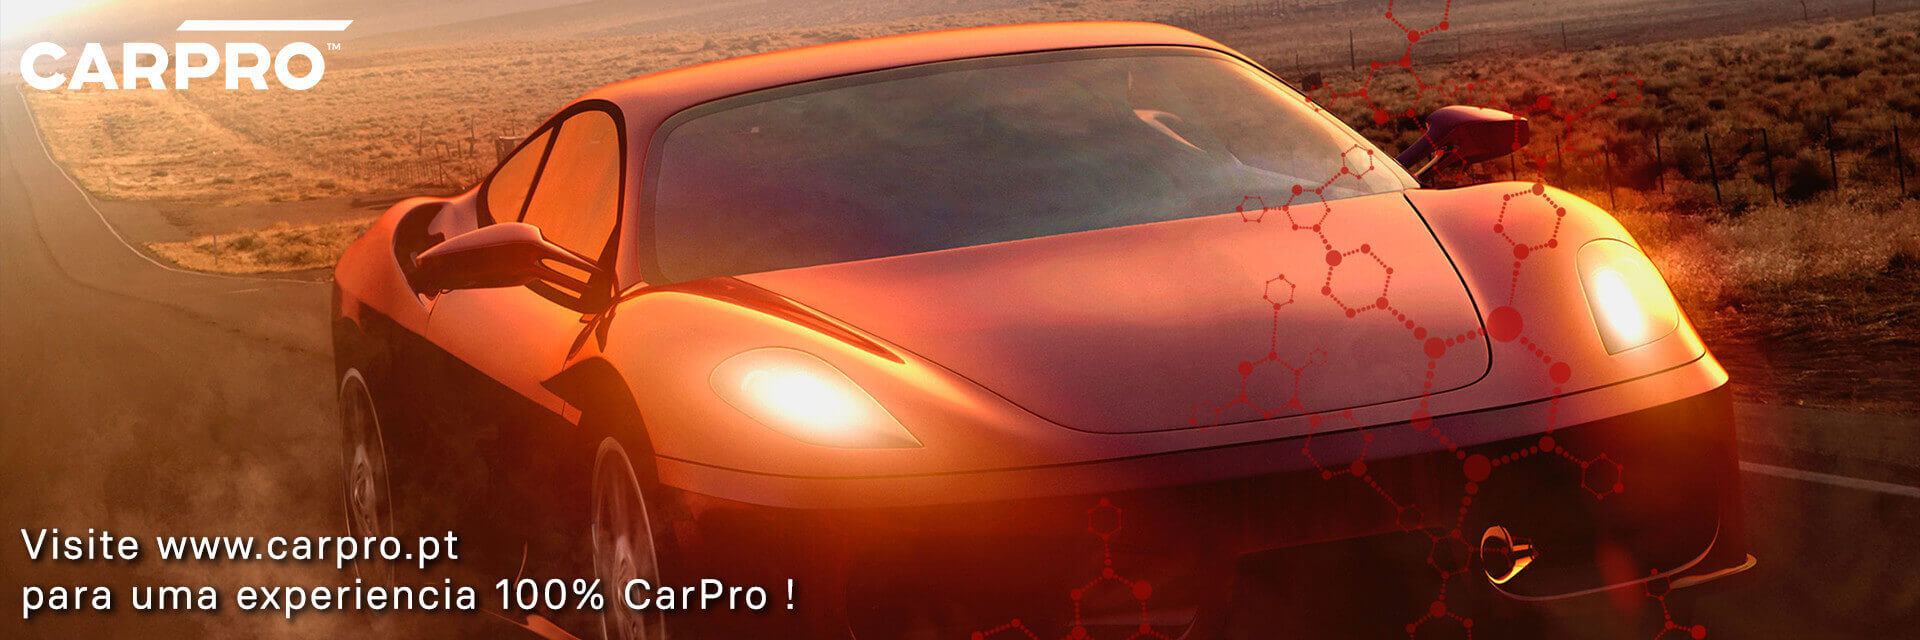 CarPro.pt